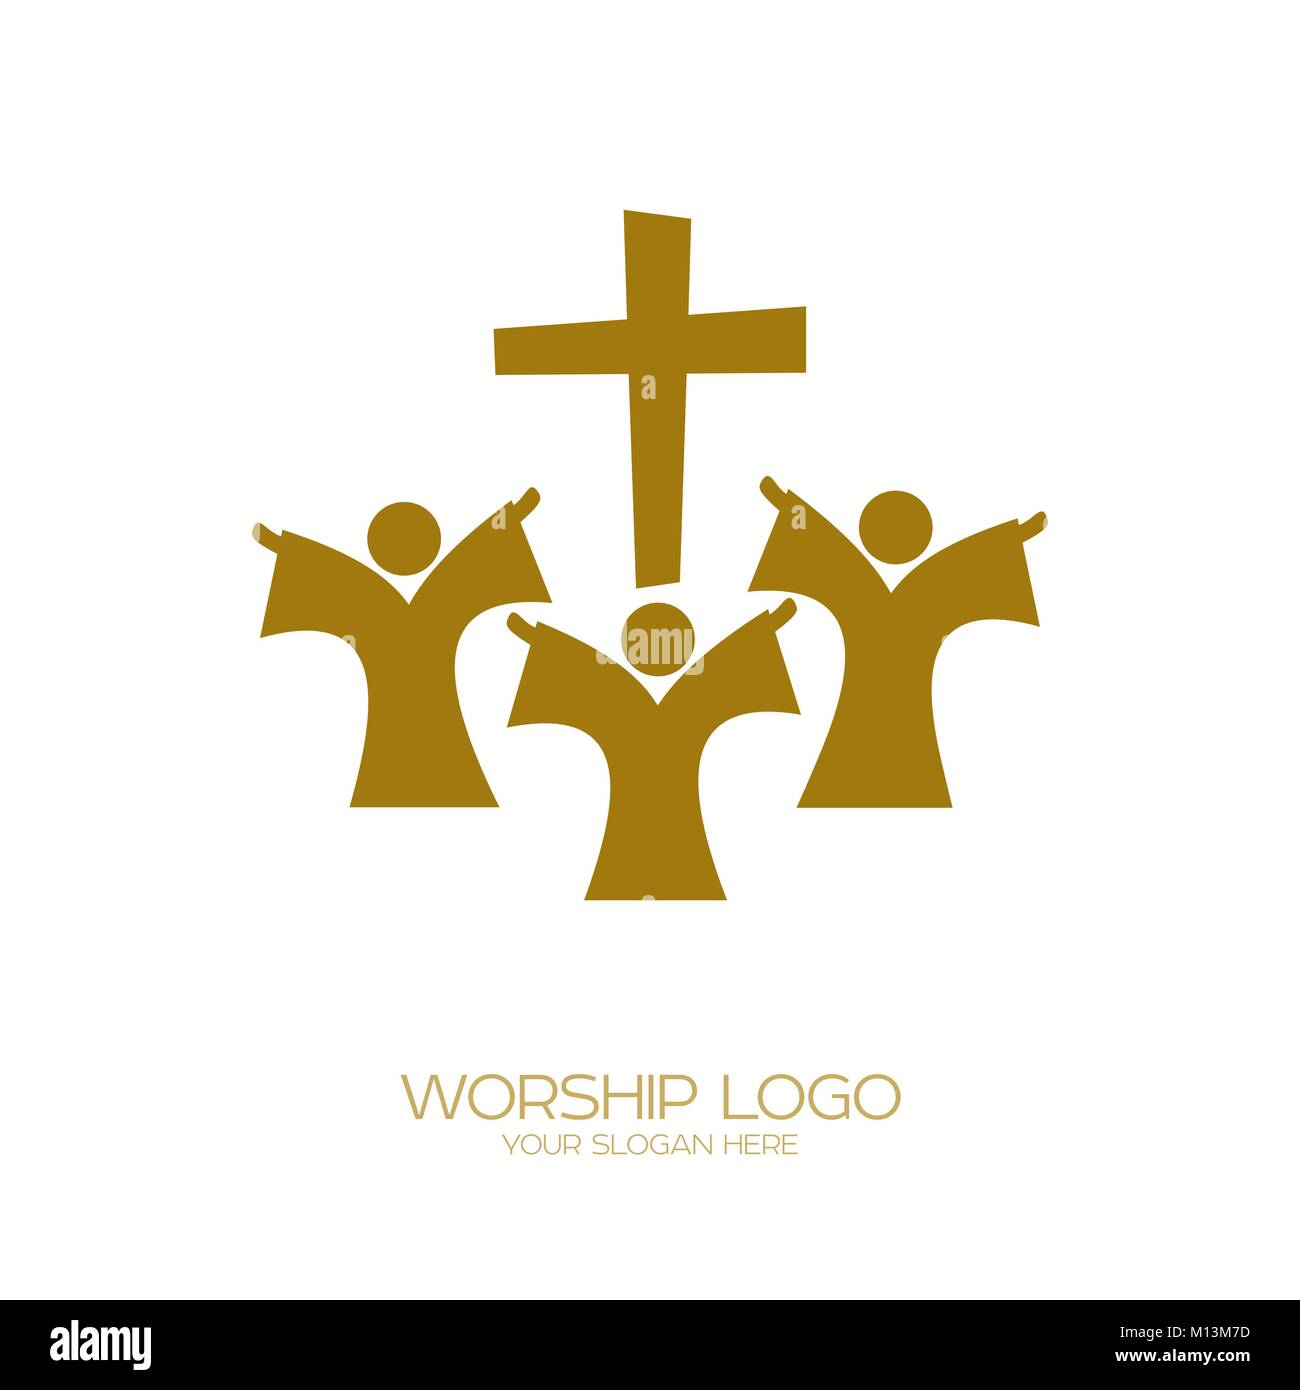 Music logo christian symbols people worship jesus christ stock christian symbols people worship jesus christ buycottarizona Image collections